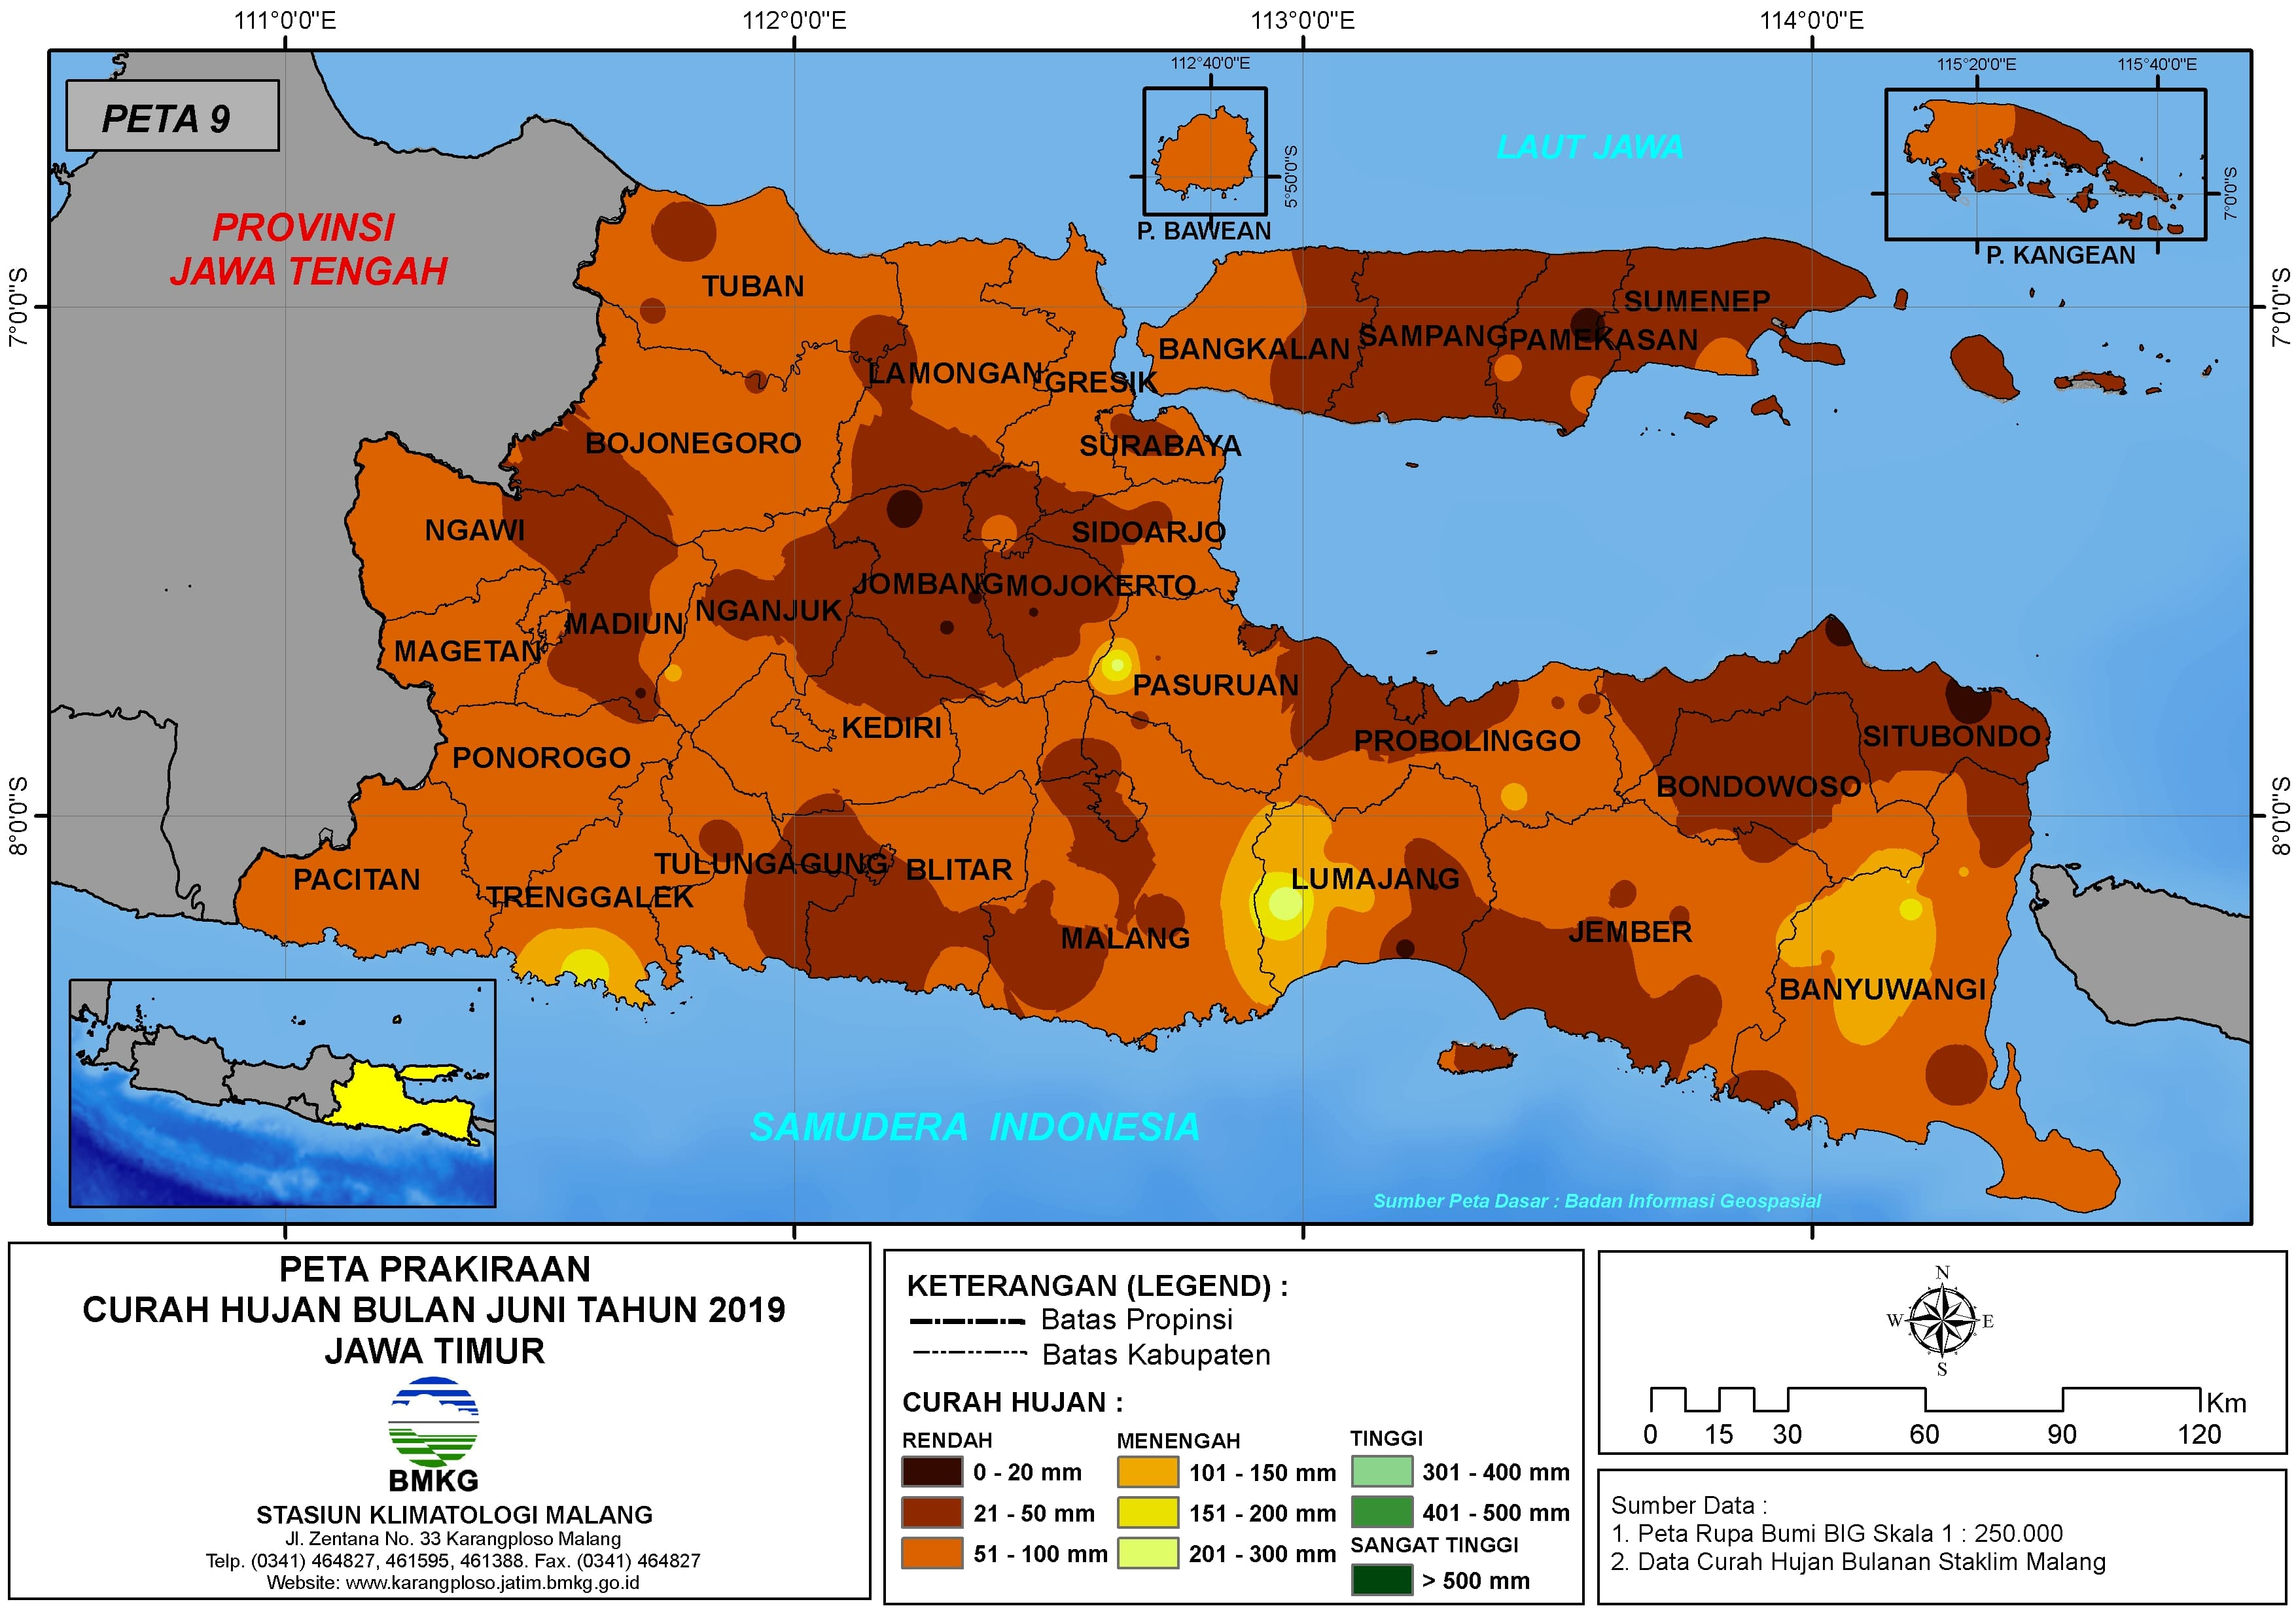 Prakiraan Curah Hujan Bulan Juni Tahun 2019 di Provinsi Jawa Timur Update dari Analisis Bulan Februari 2019